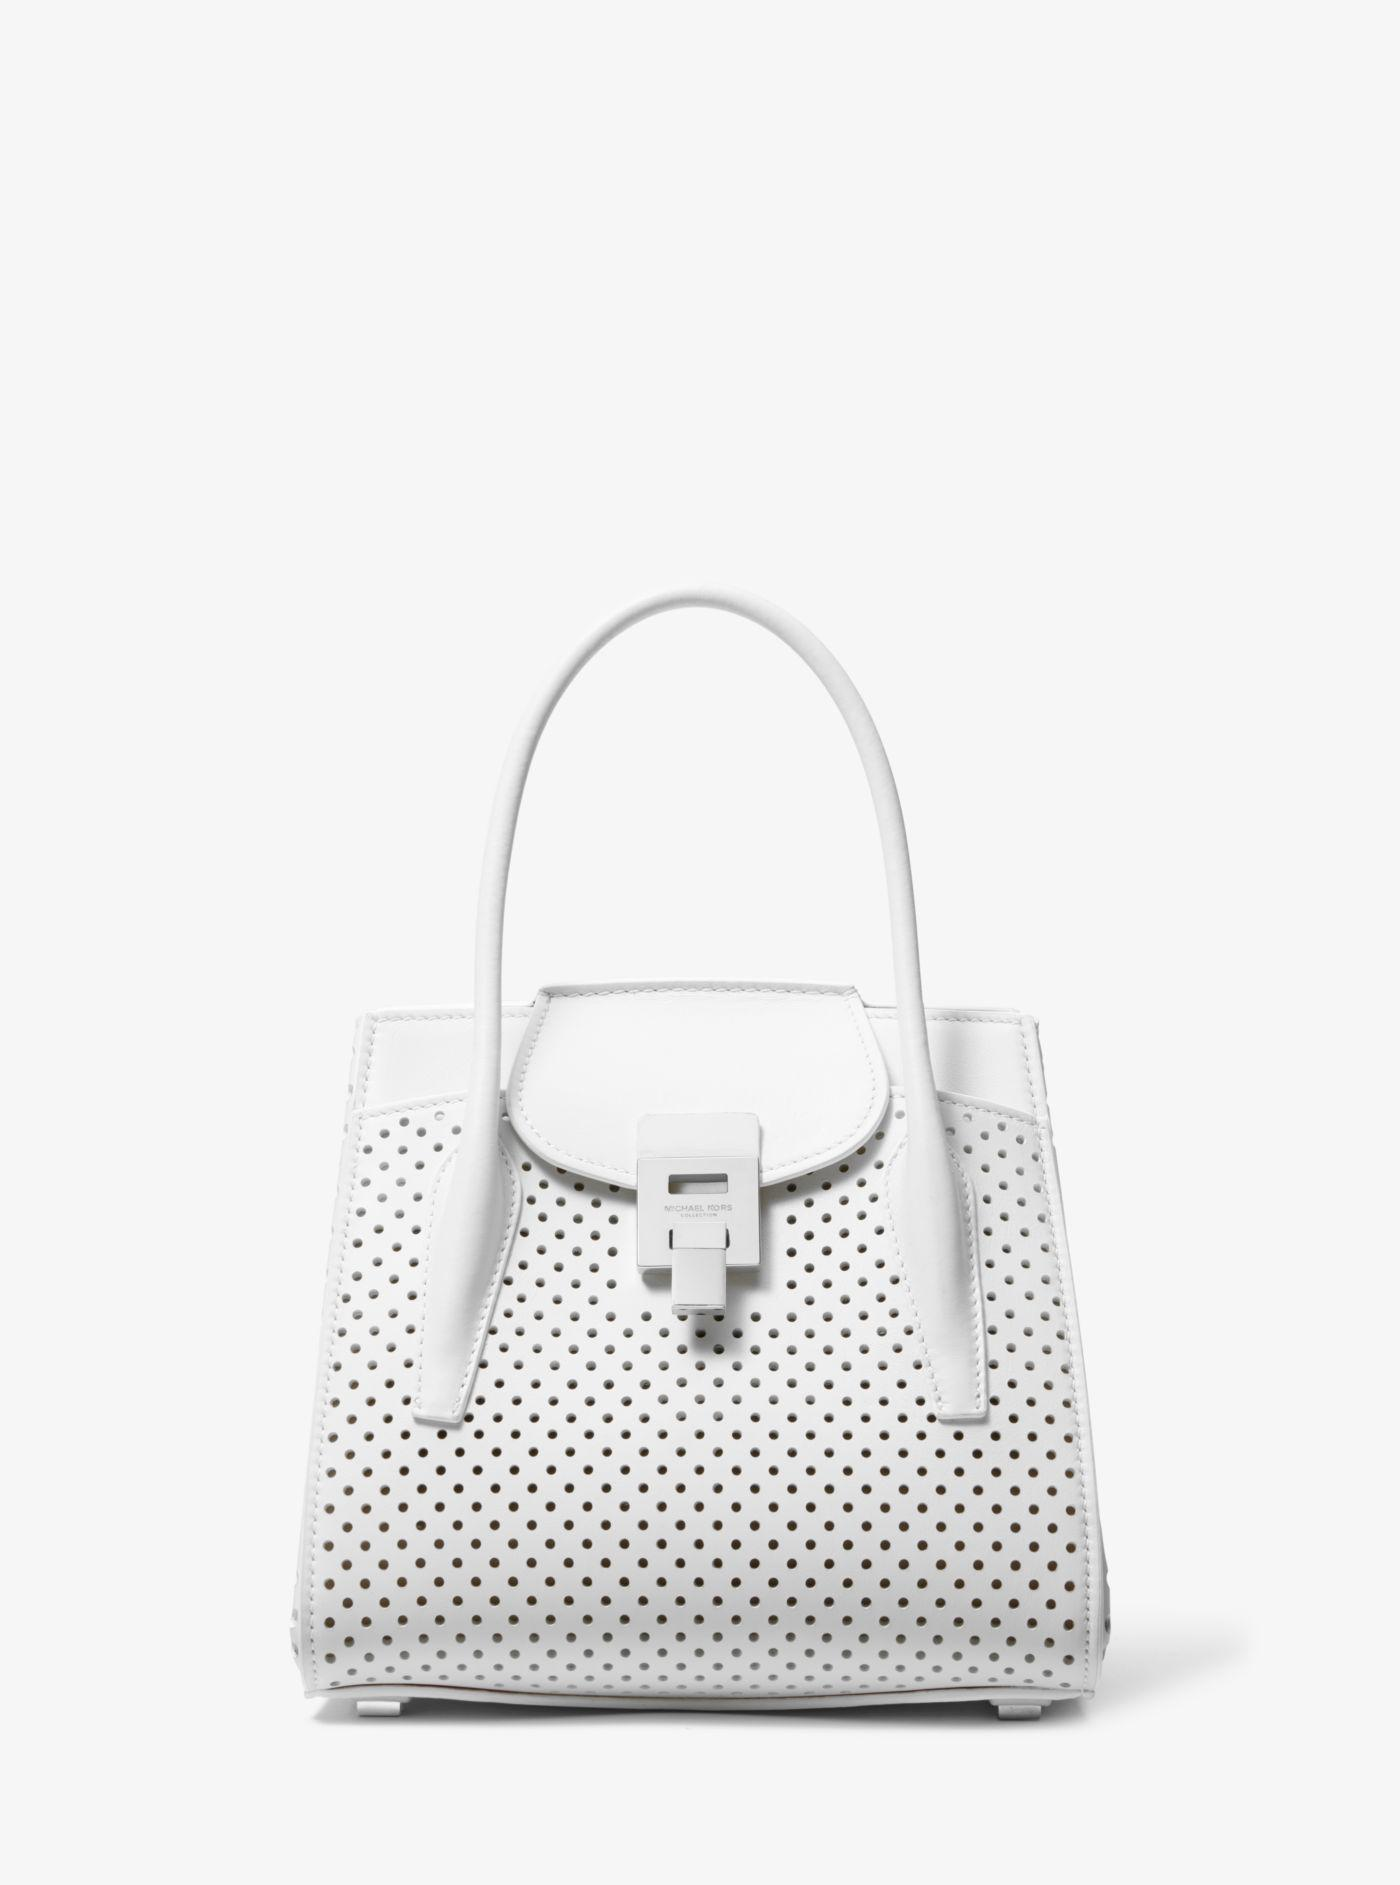 9dbc8f17fda0 Michael Kors. Women's White Bancroft Medium Perforated Calf Leather Satchel